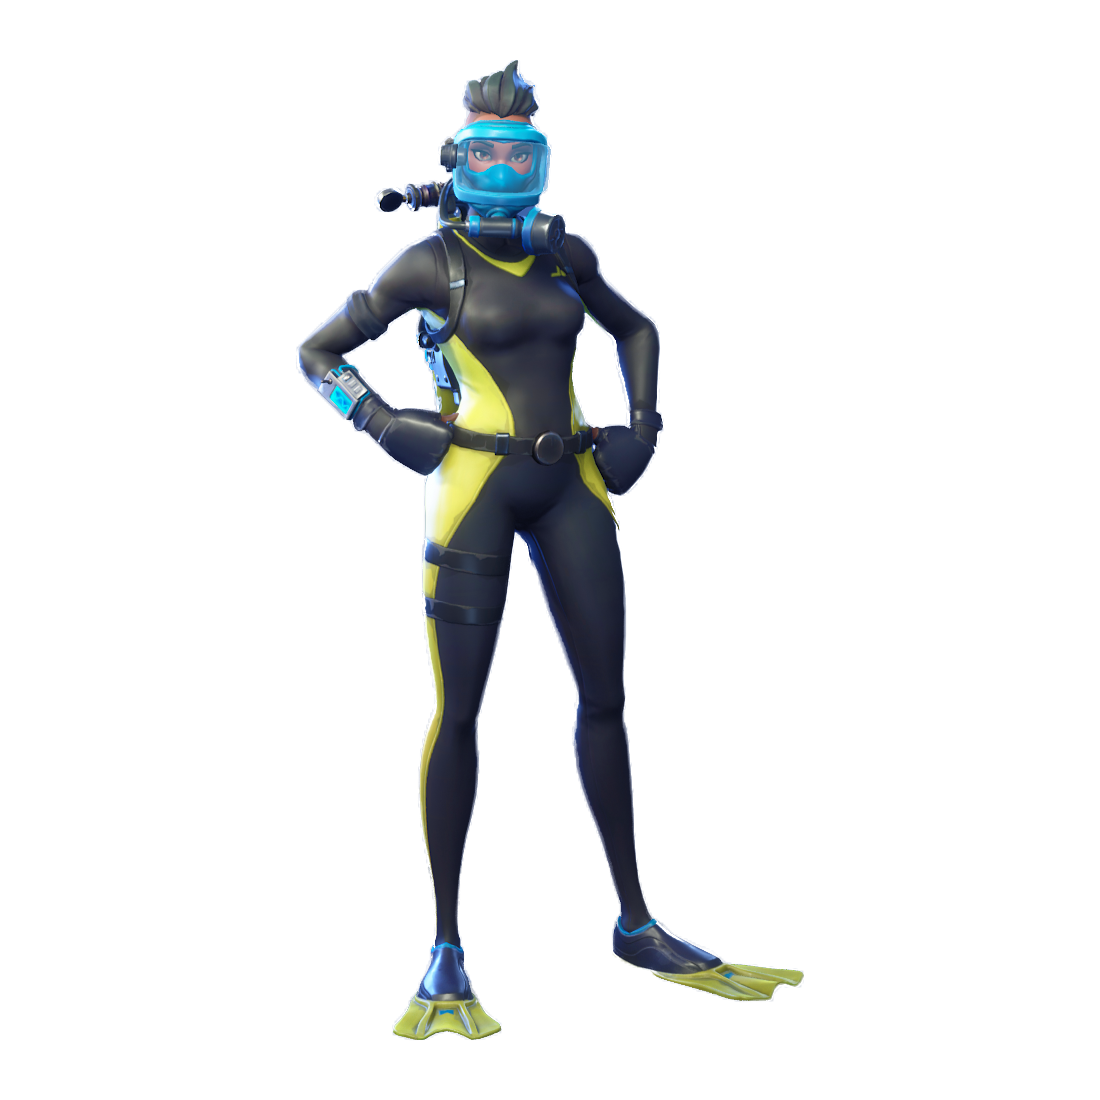 Reef Ranger - Коралловый рейнджер (Reef Ranger)